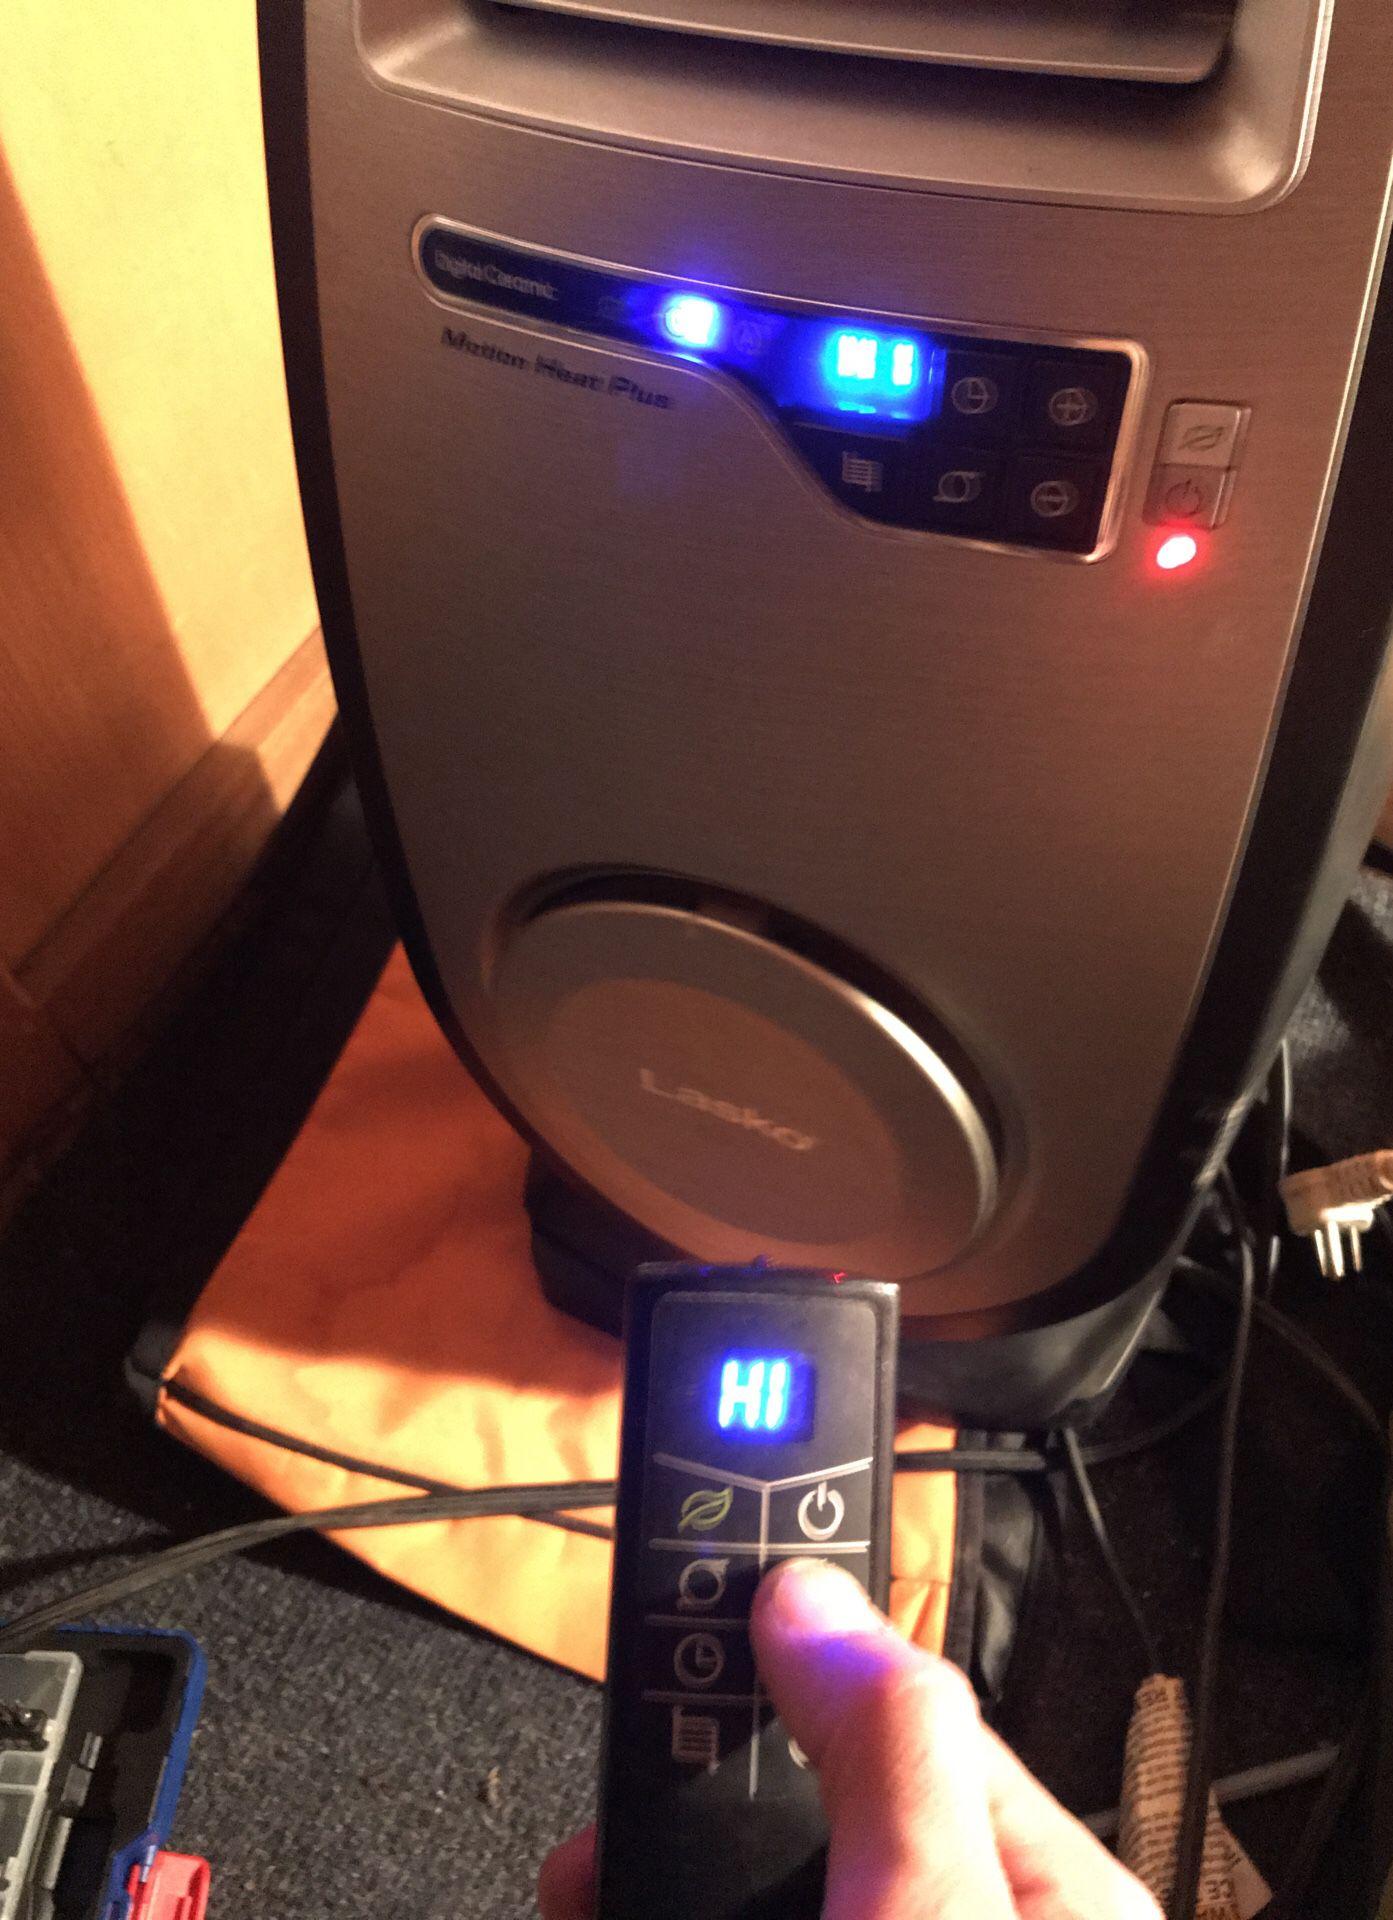 Lasko Digital Ceramic Motion Heater